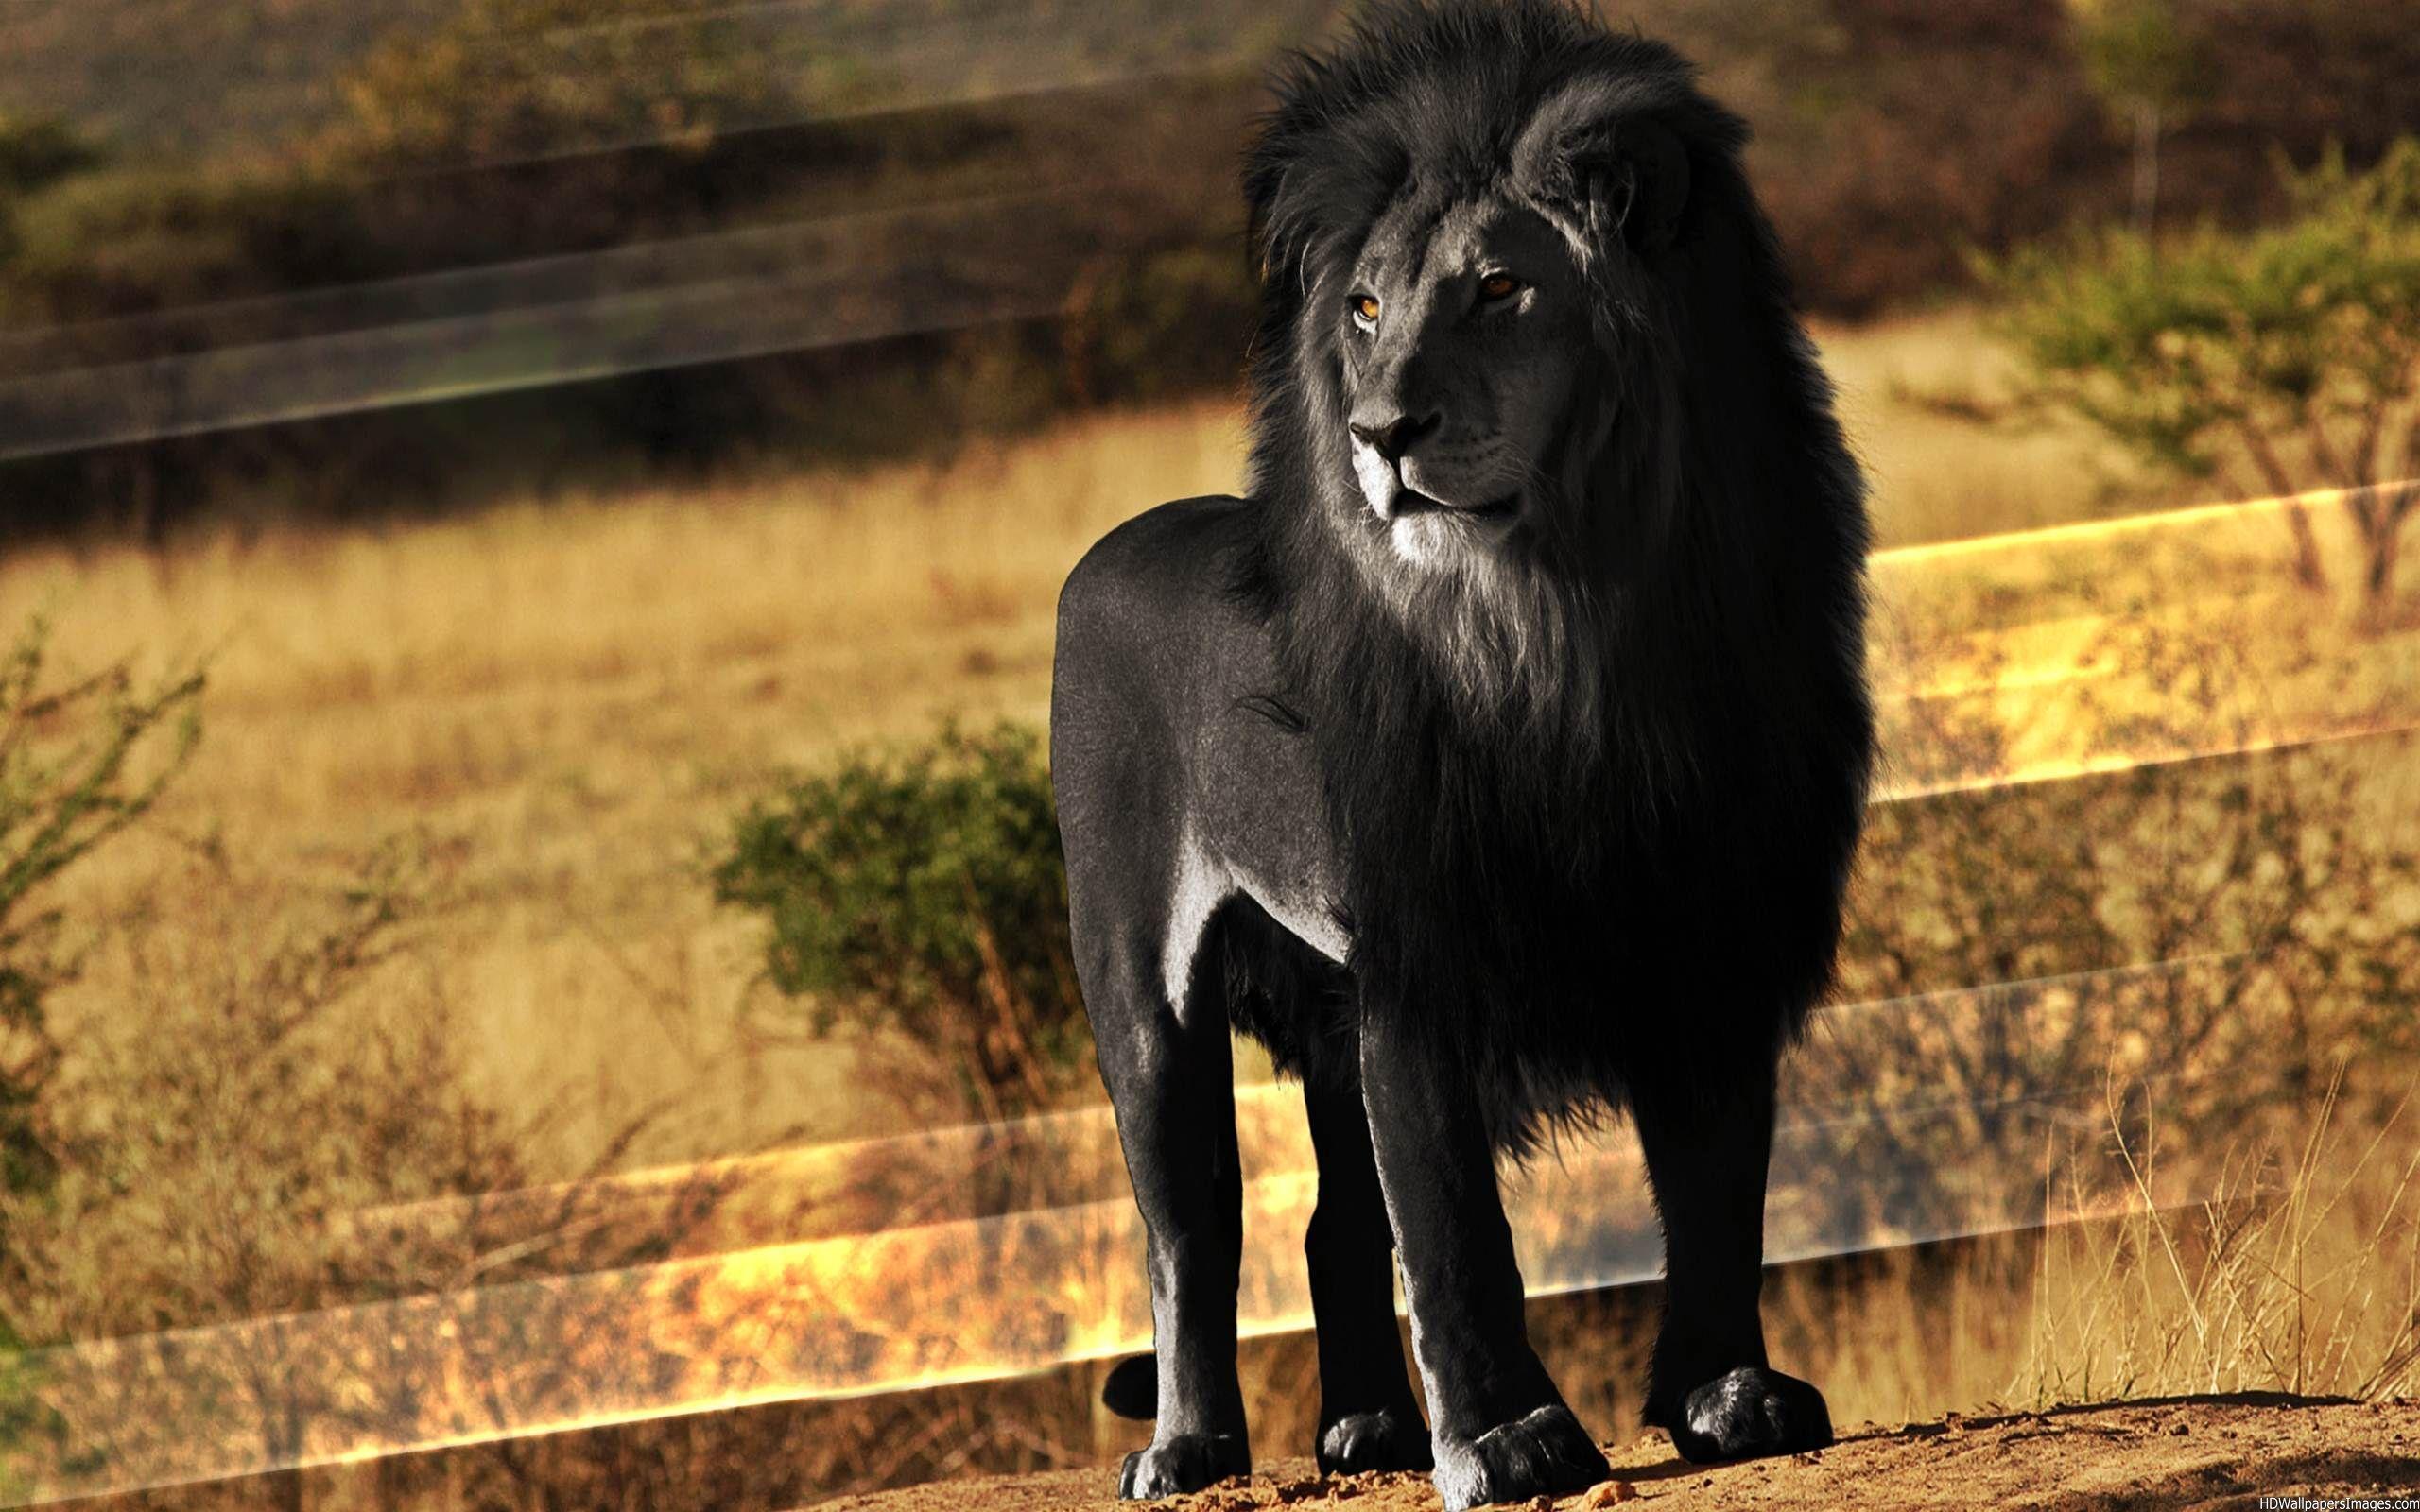 rare black lion images galleries with. Black Bedroom Furniture Sets. Home Design Ideas